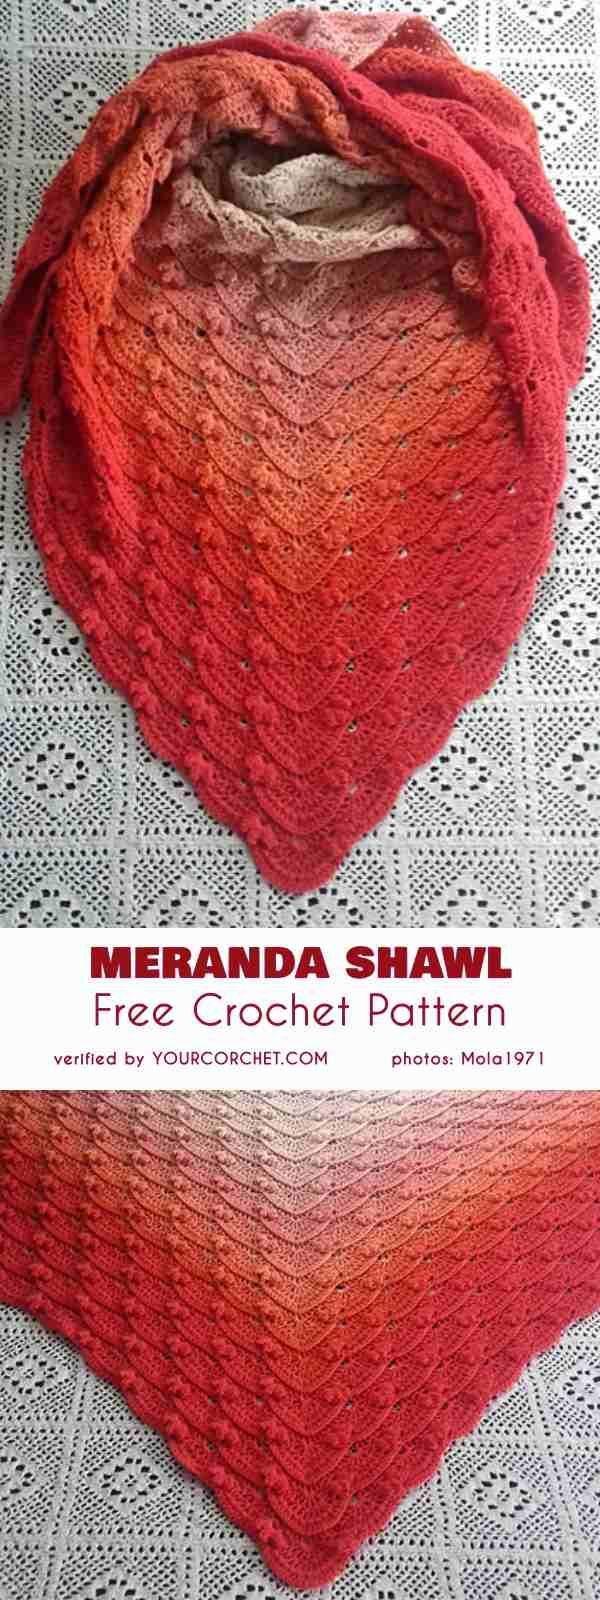 Meranda Shawl Free Crochet Pattern